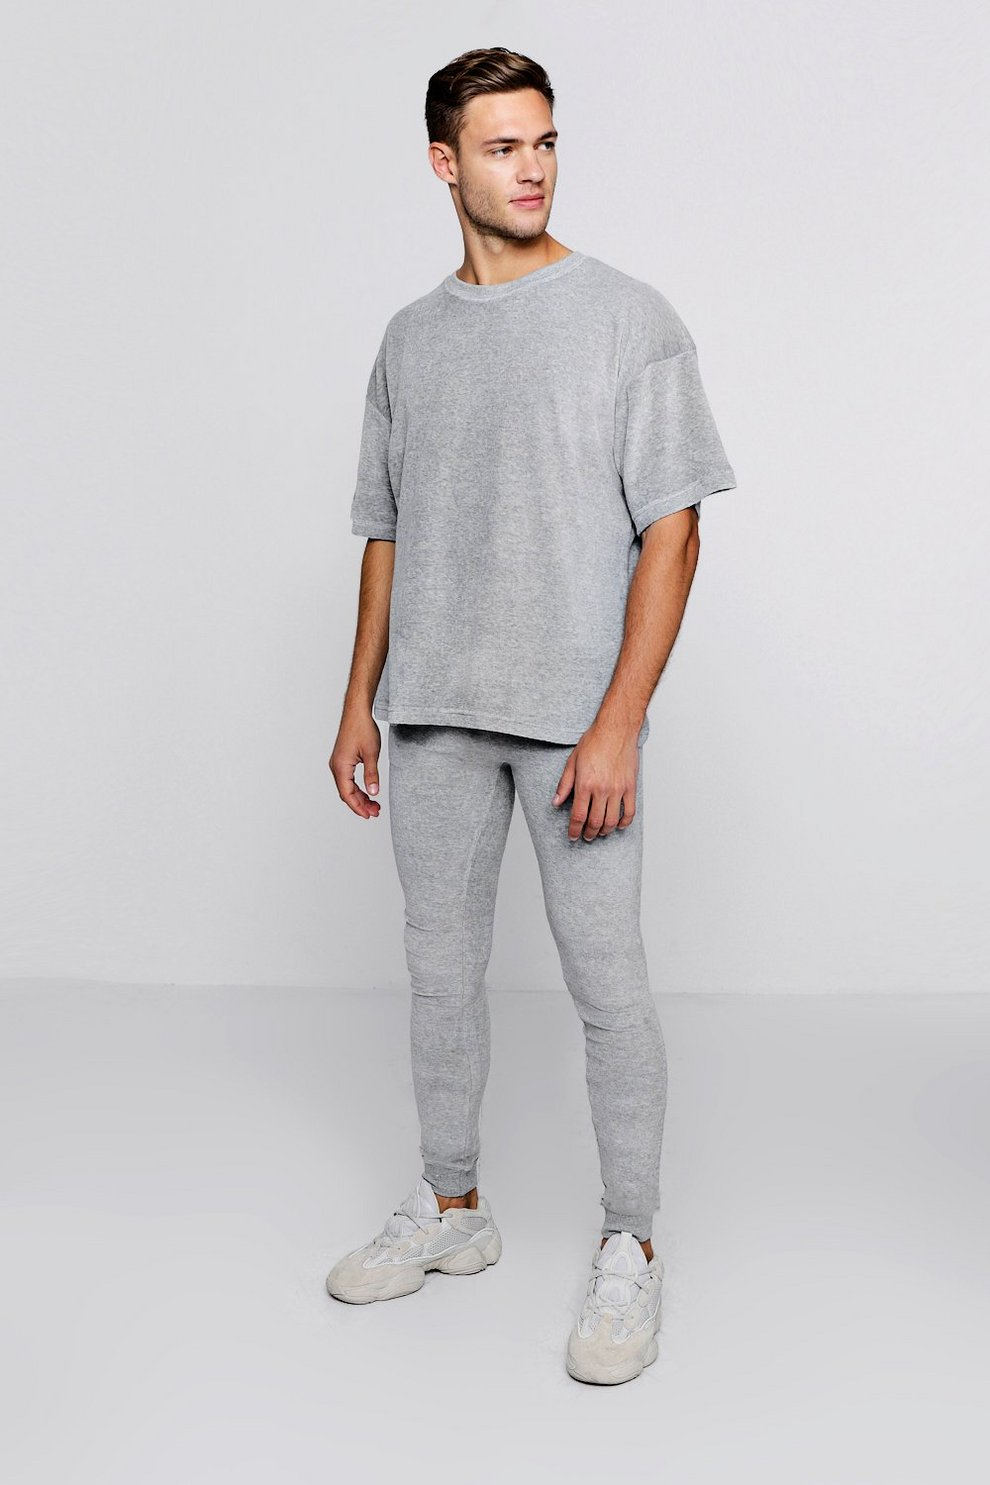 be467d3a3471 Oversized Velour T-Shirt   Jogger Set - boohooMAN